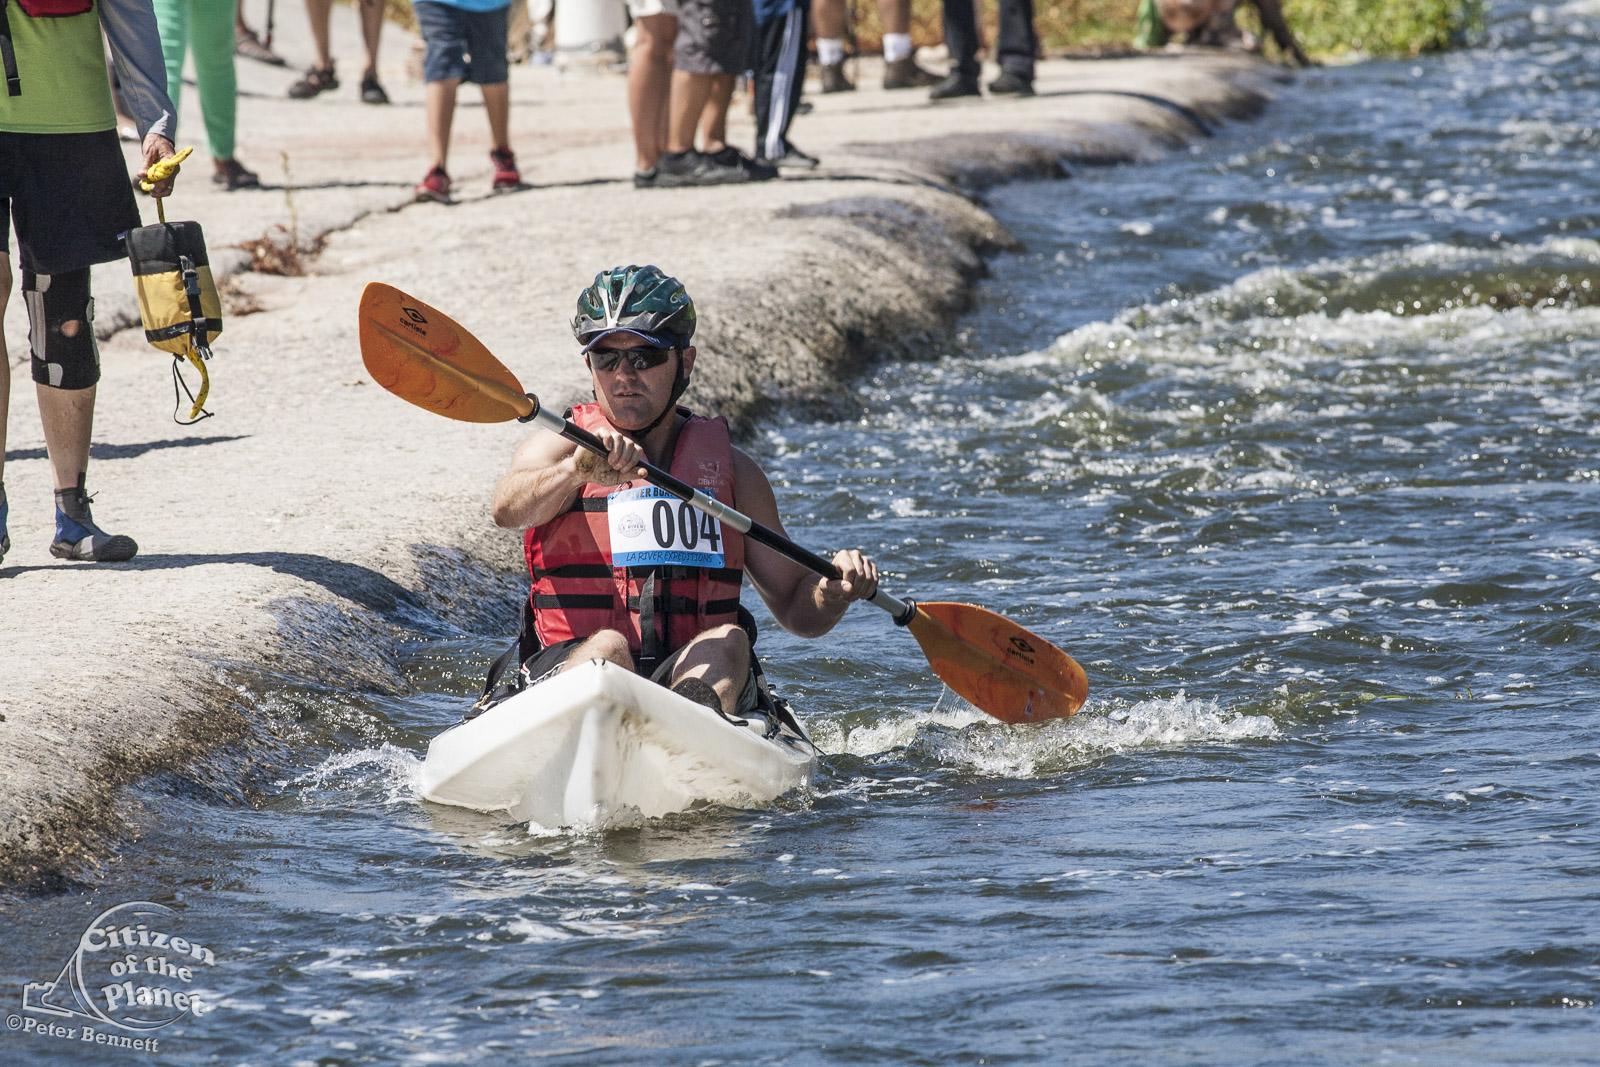 US_CA_48_3858_la_river_boat_race.jpg